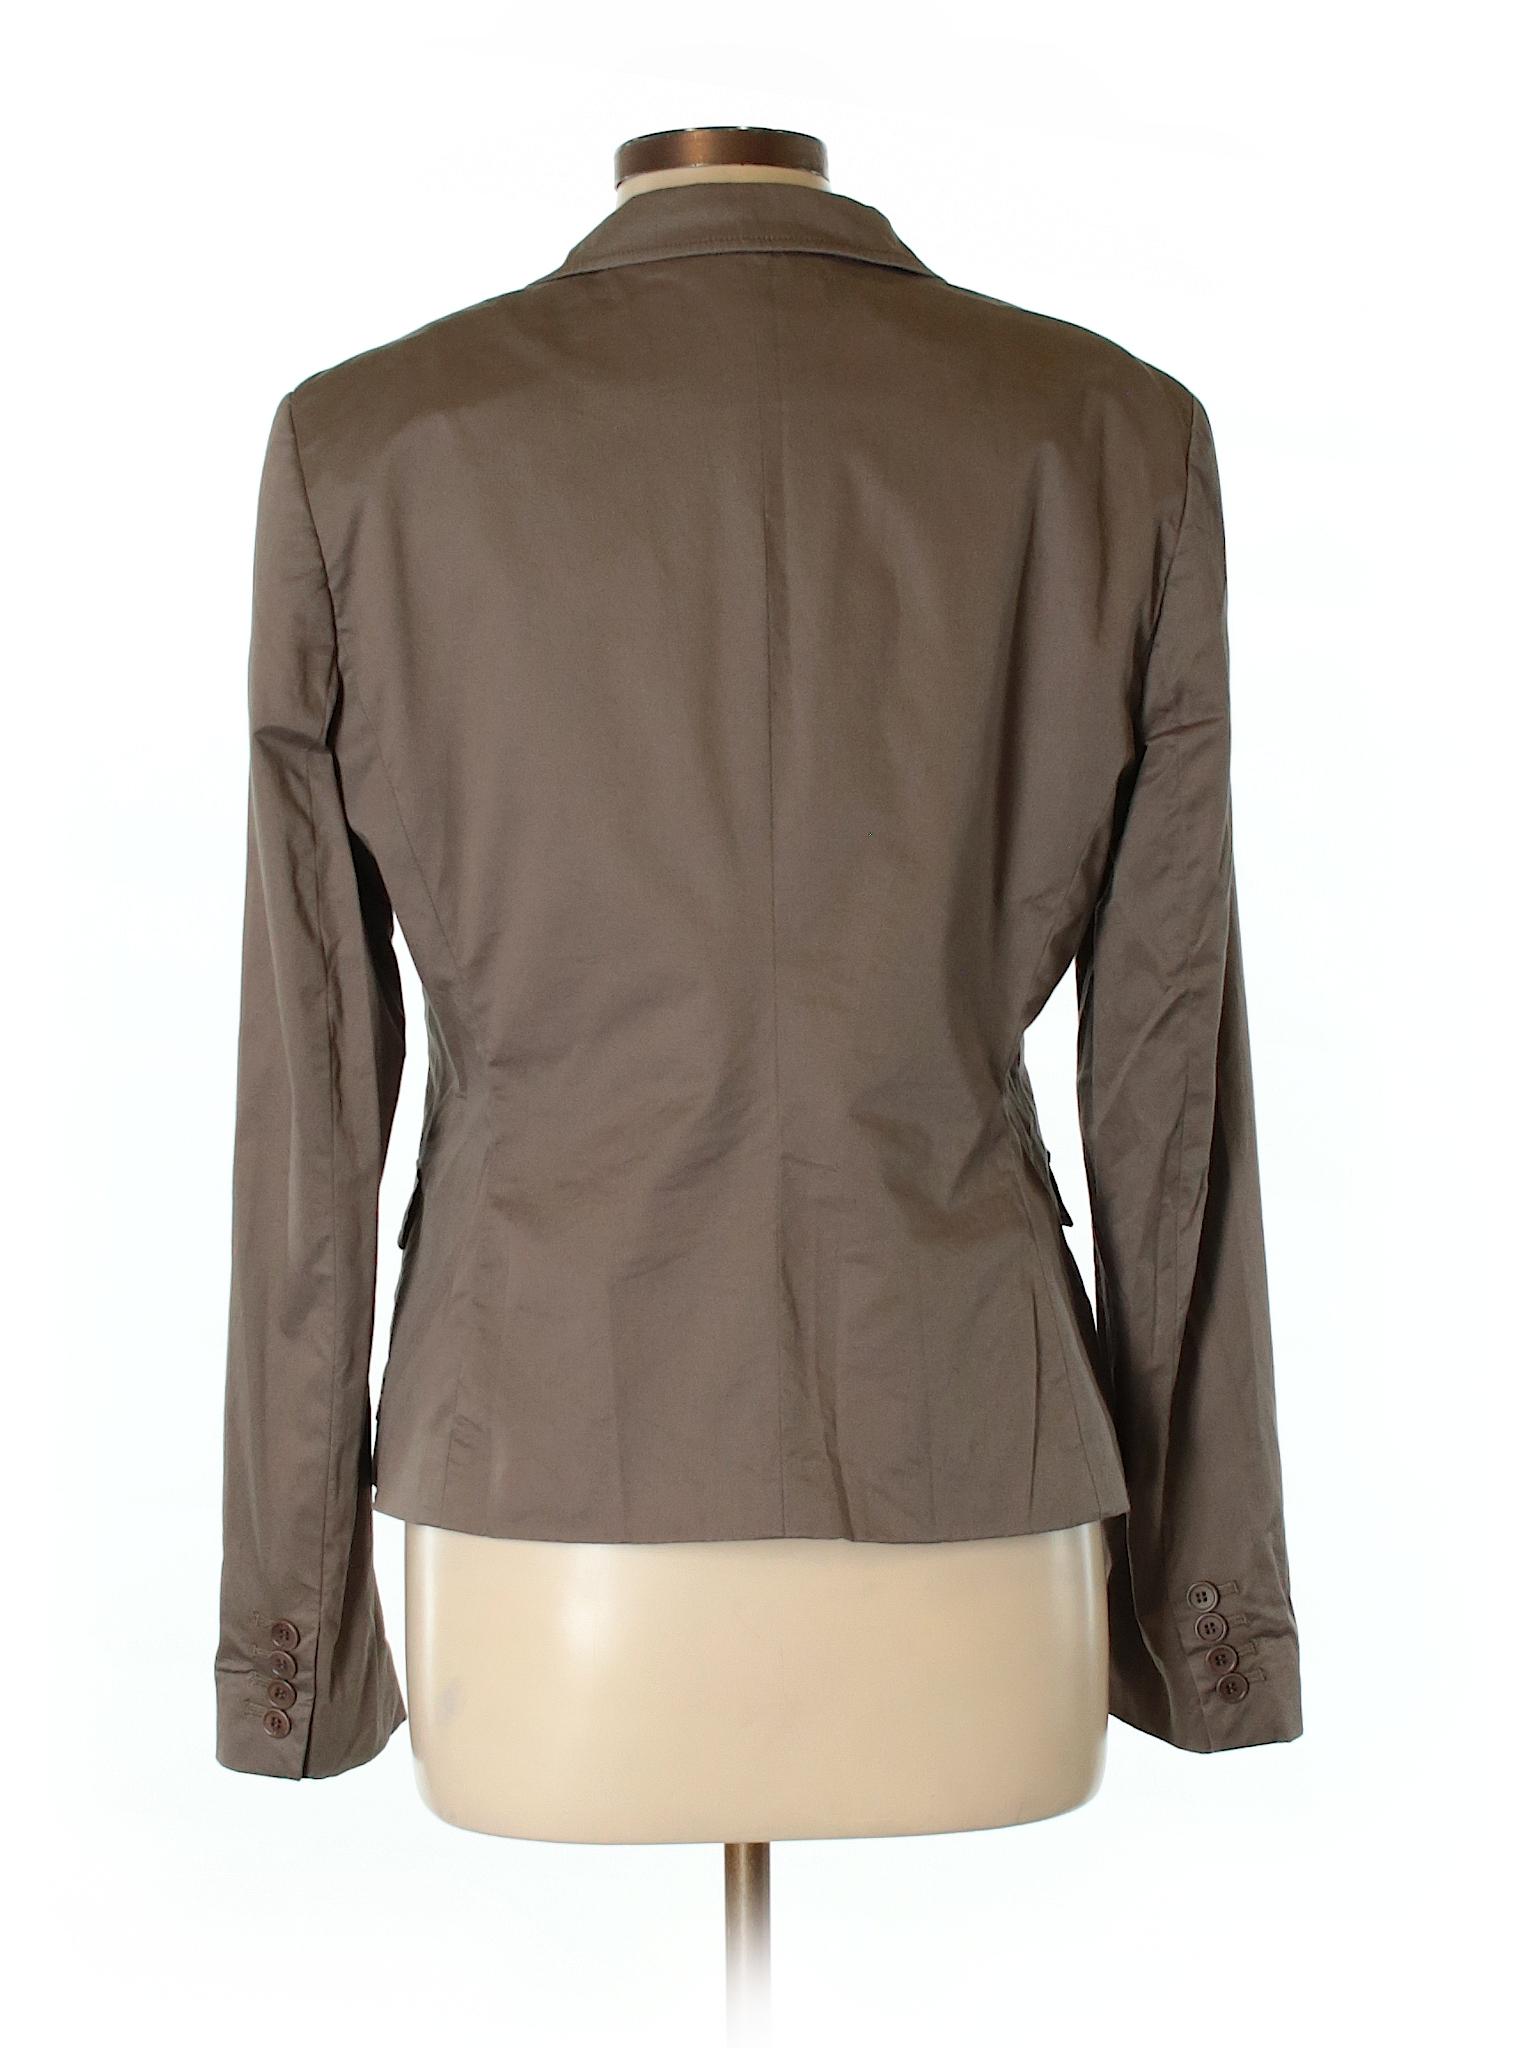 winter Boutique winter Jacket Boutique Calvin Klein Klein Calvin q8qxwBI6d